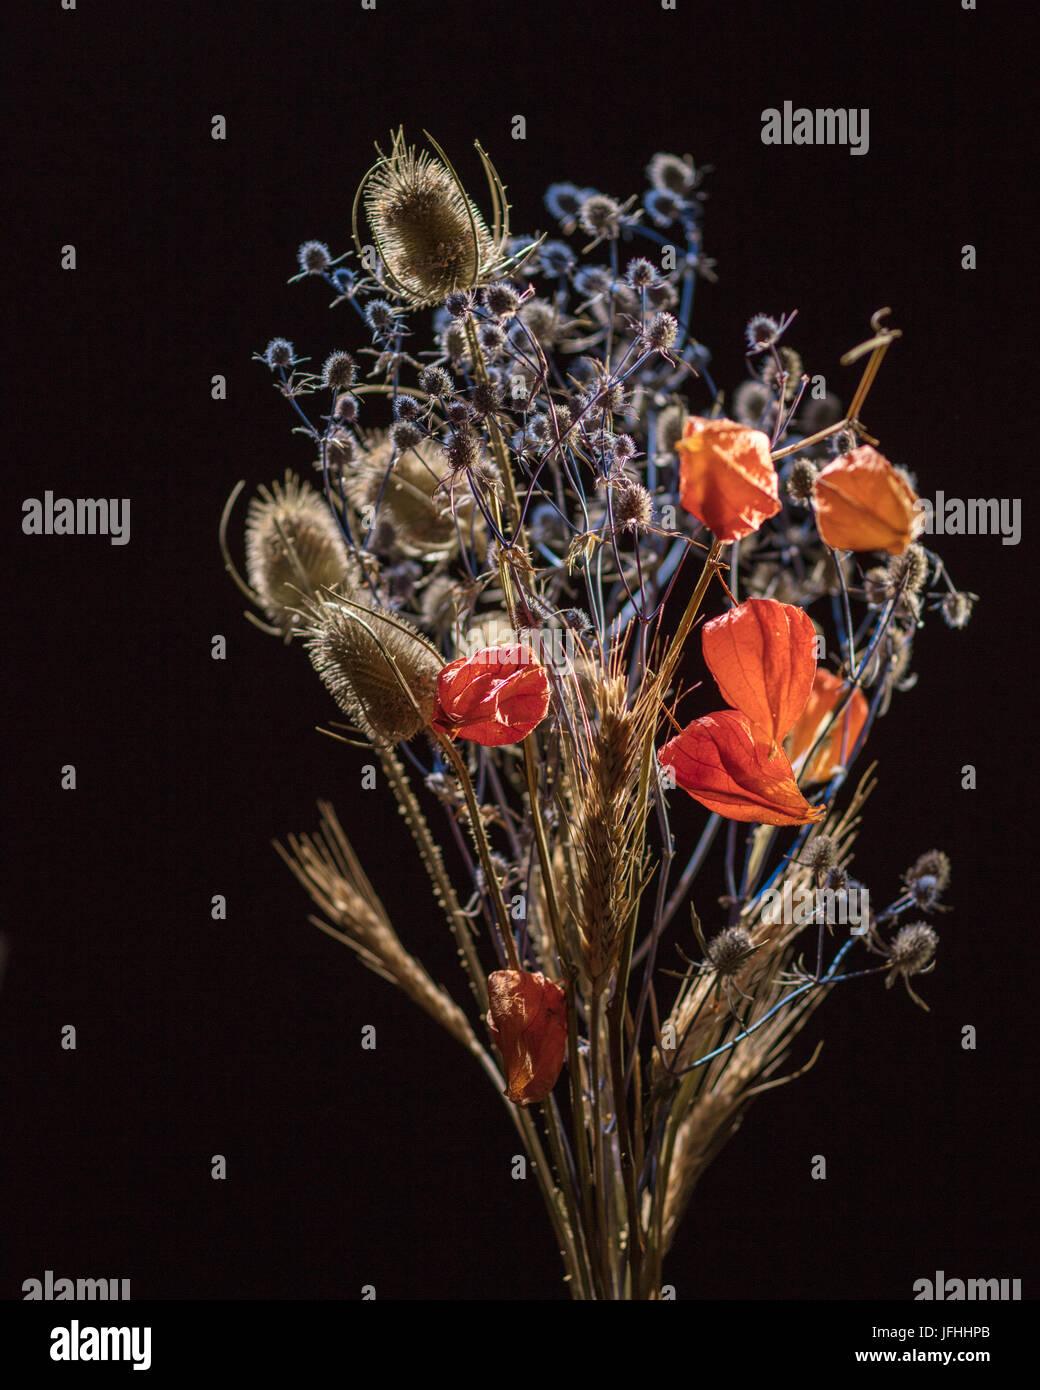 Dry flowers on black - Stock Image